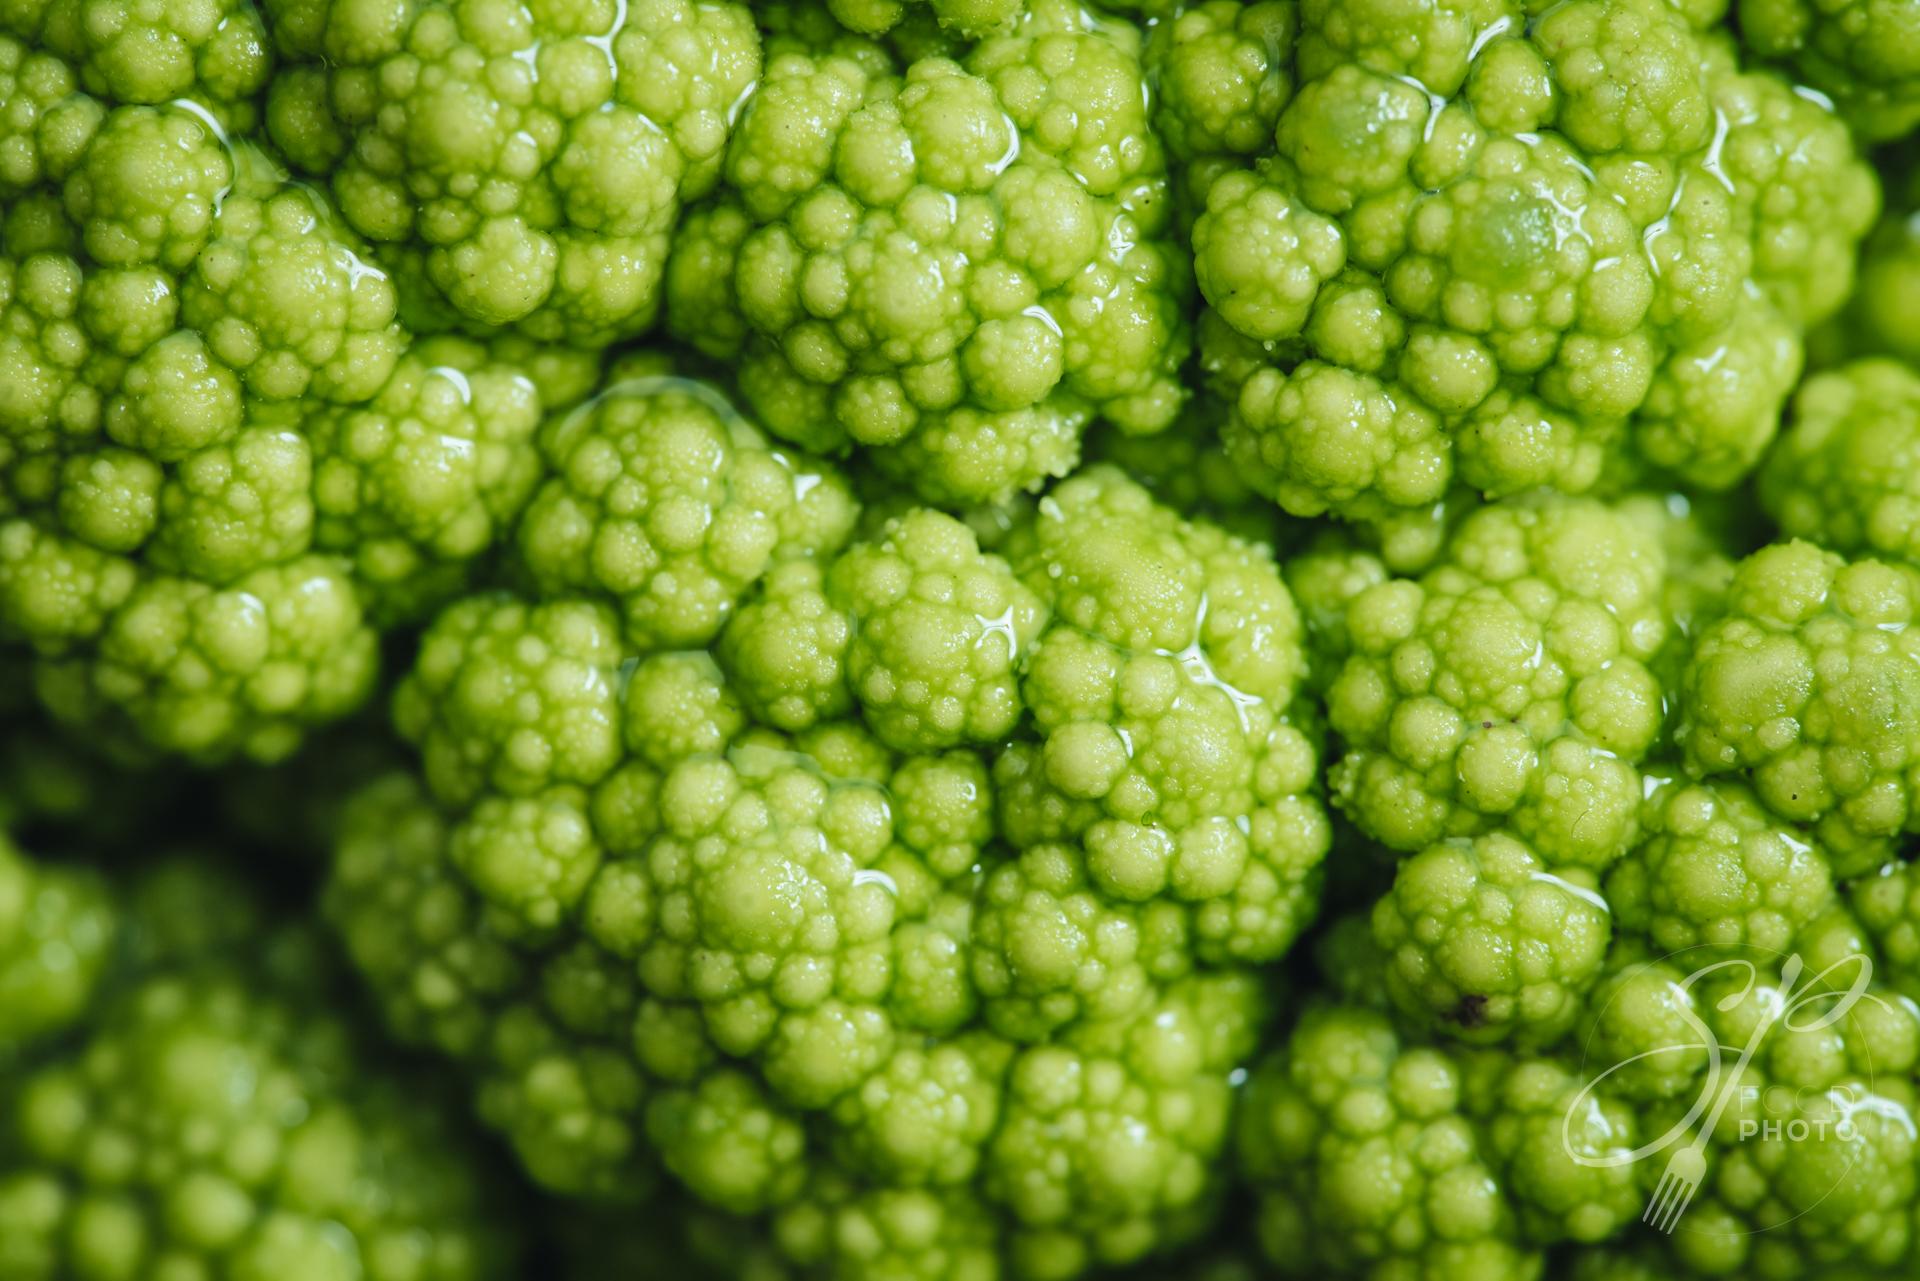 Raw fresh green cauliflower from Puglia